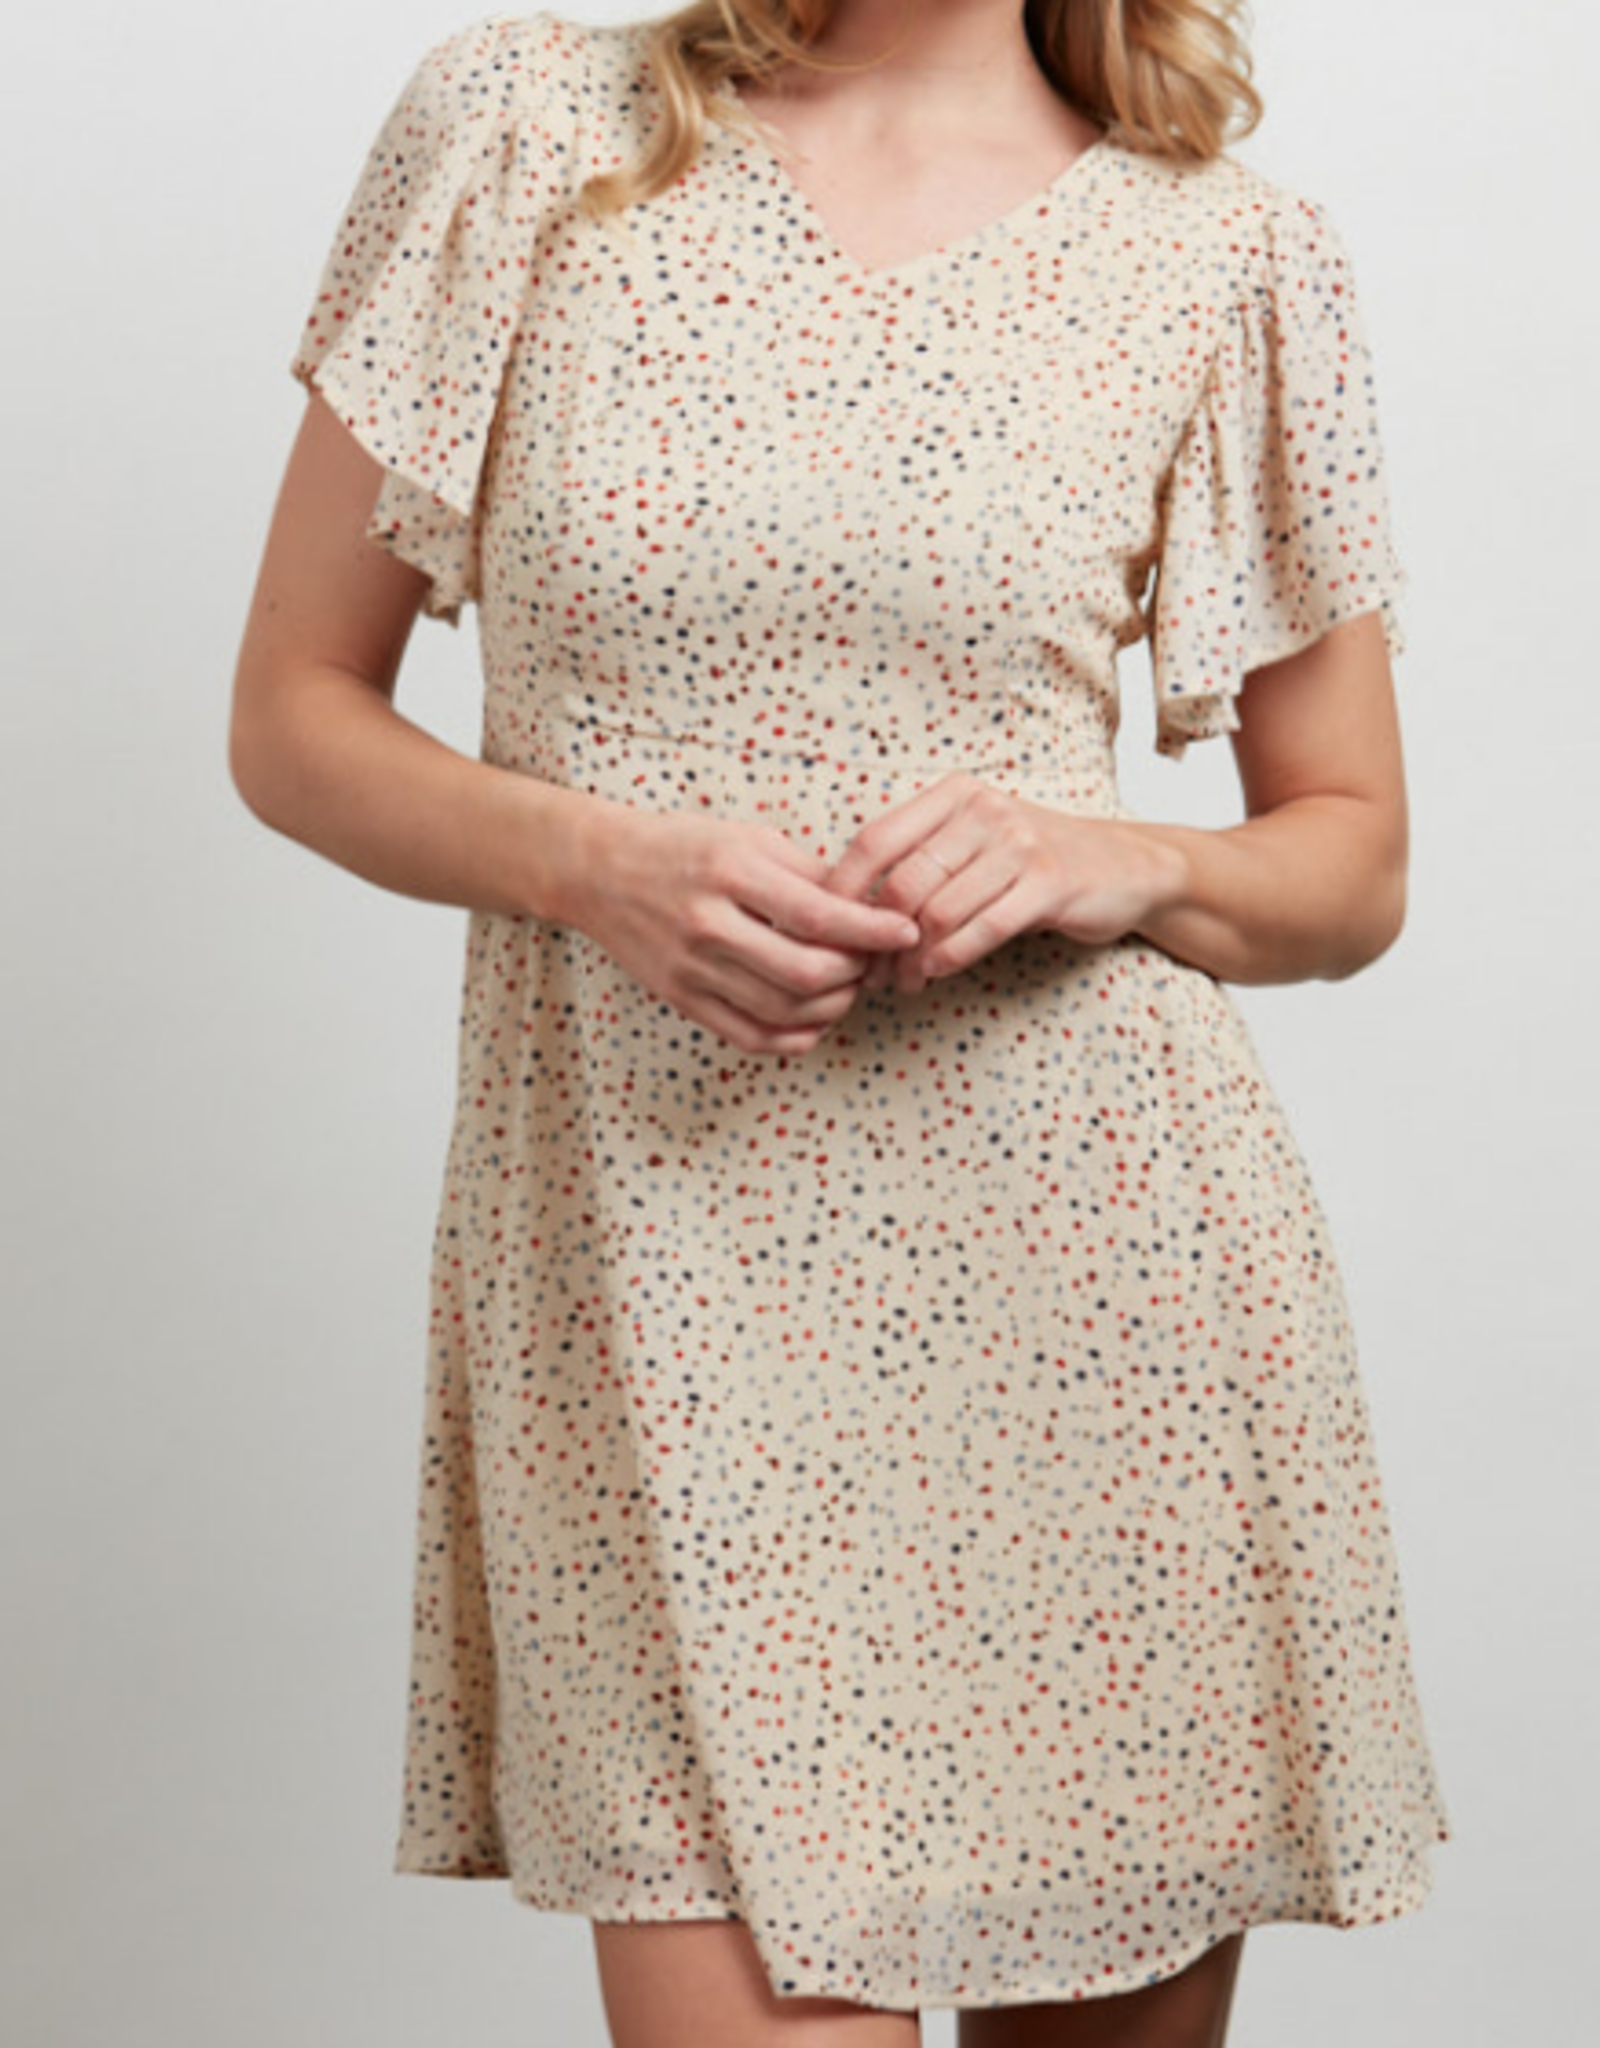 SM Wardrobe All Over Dots Print Dress